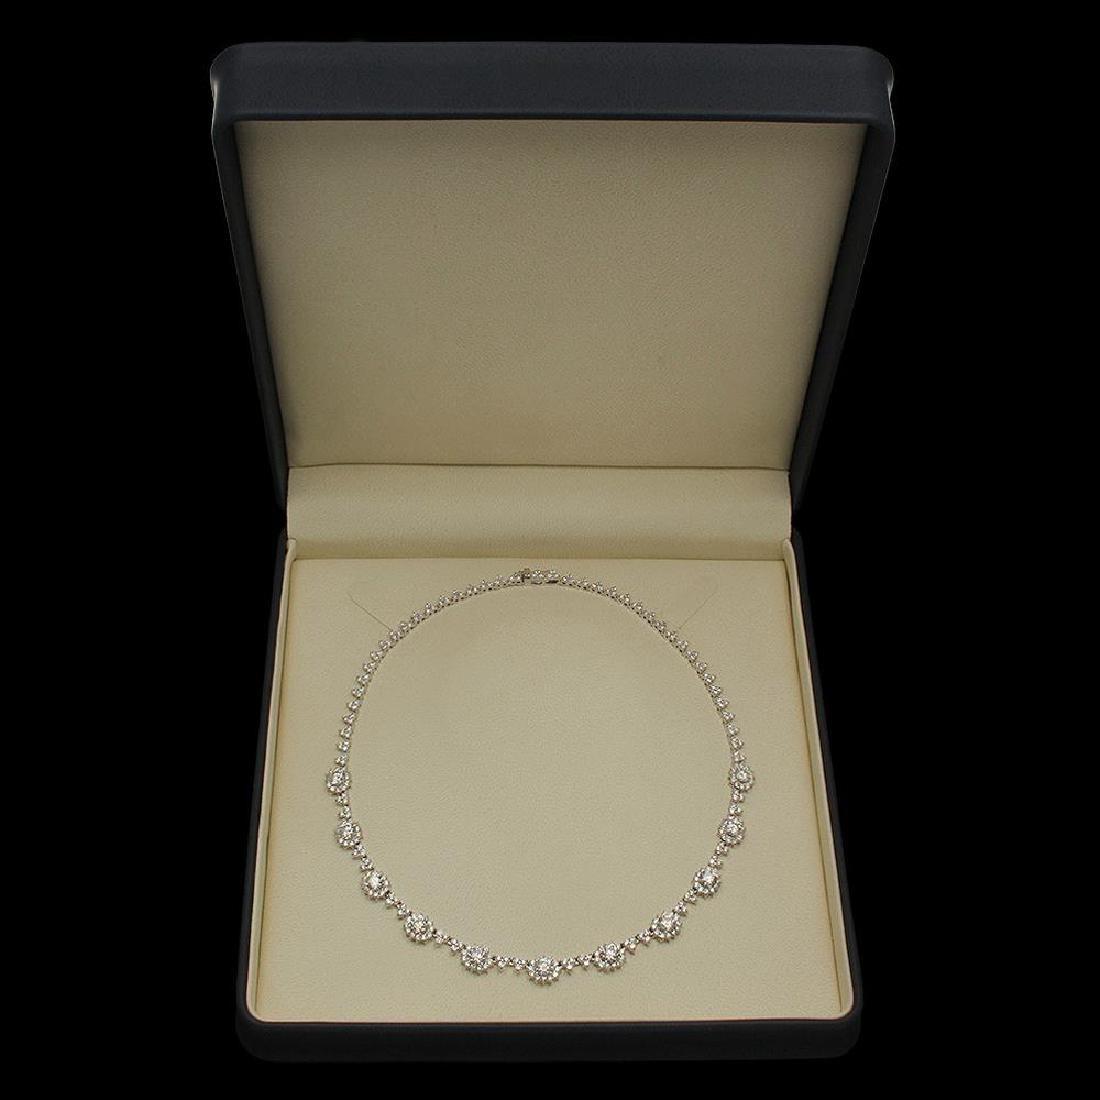 18K Gold 16.81ct Diamond Necklace - 4